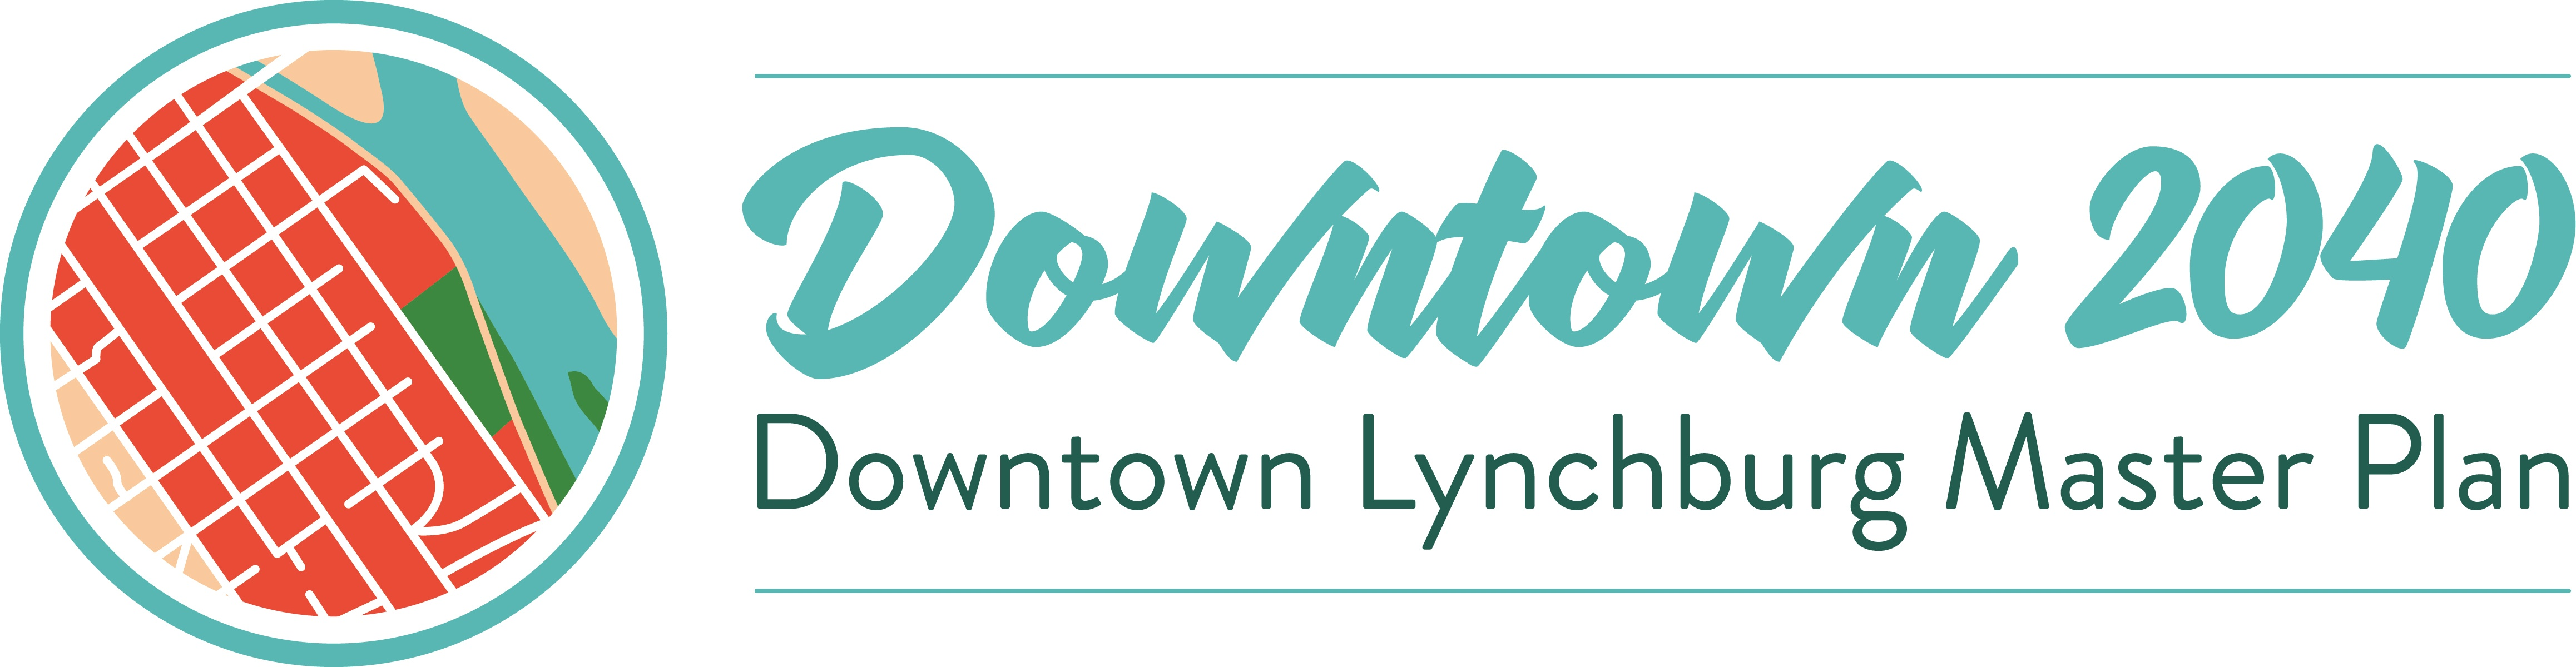 Downtown 2040_4C.jpg